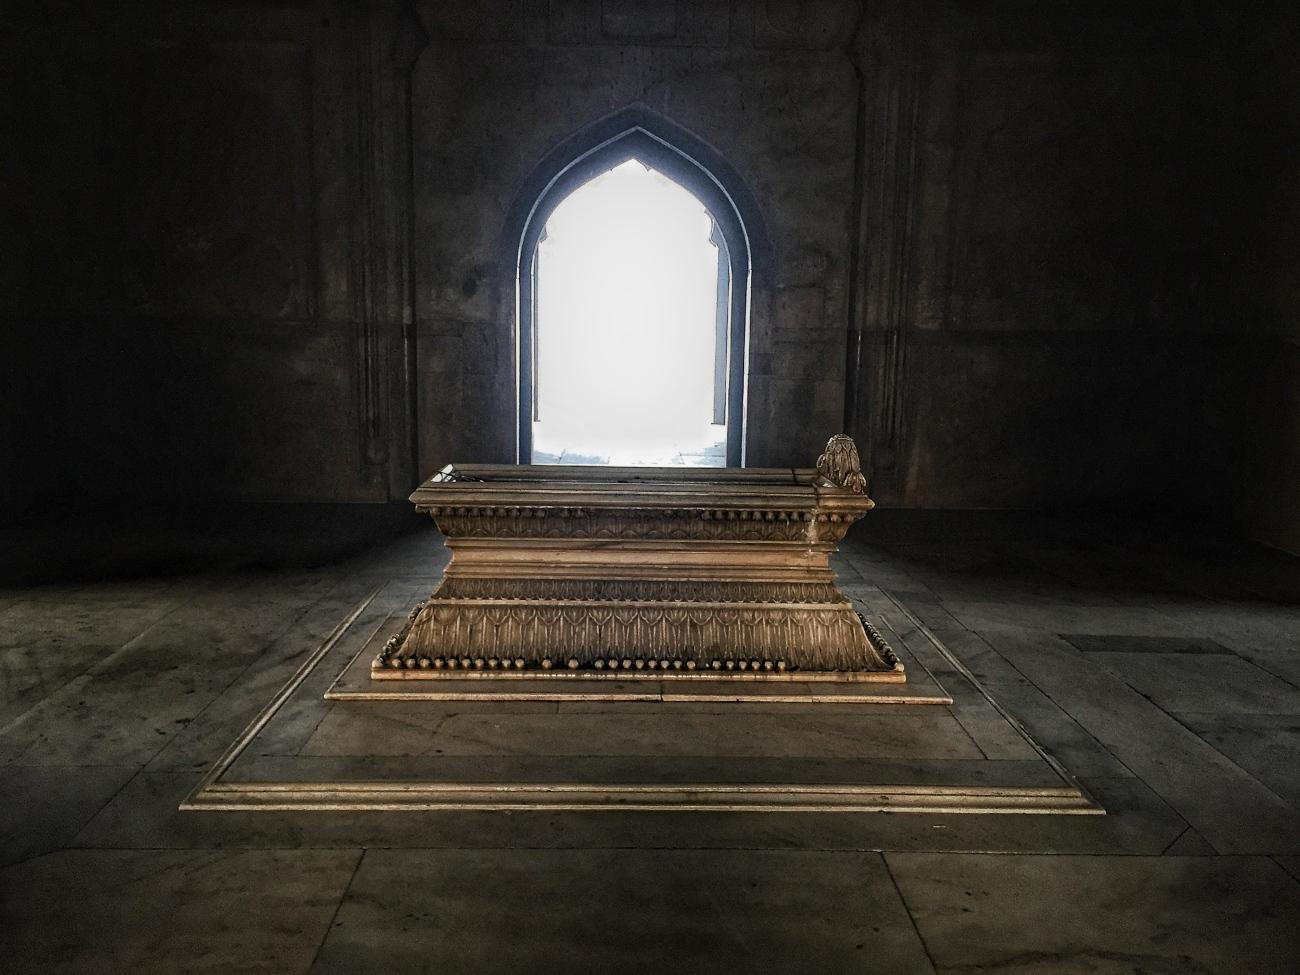 Safdarjung's Tomb - Inside